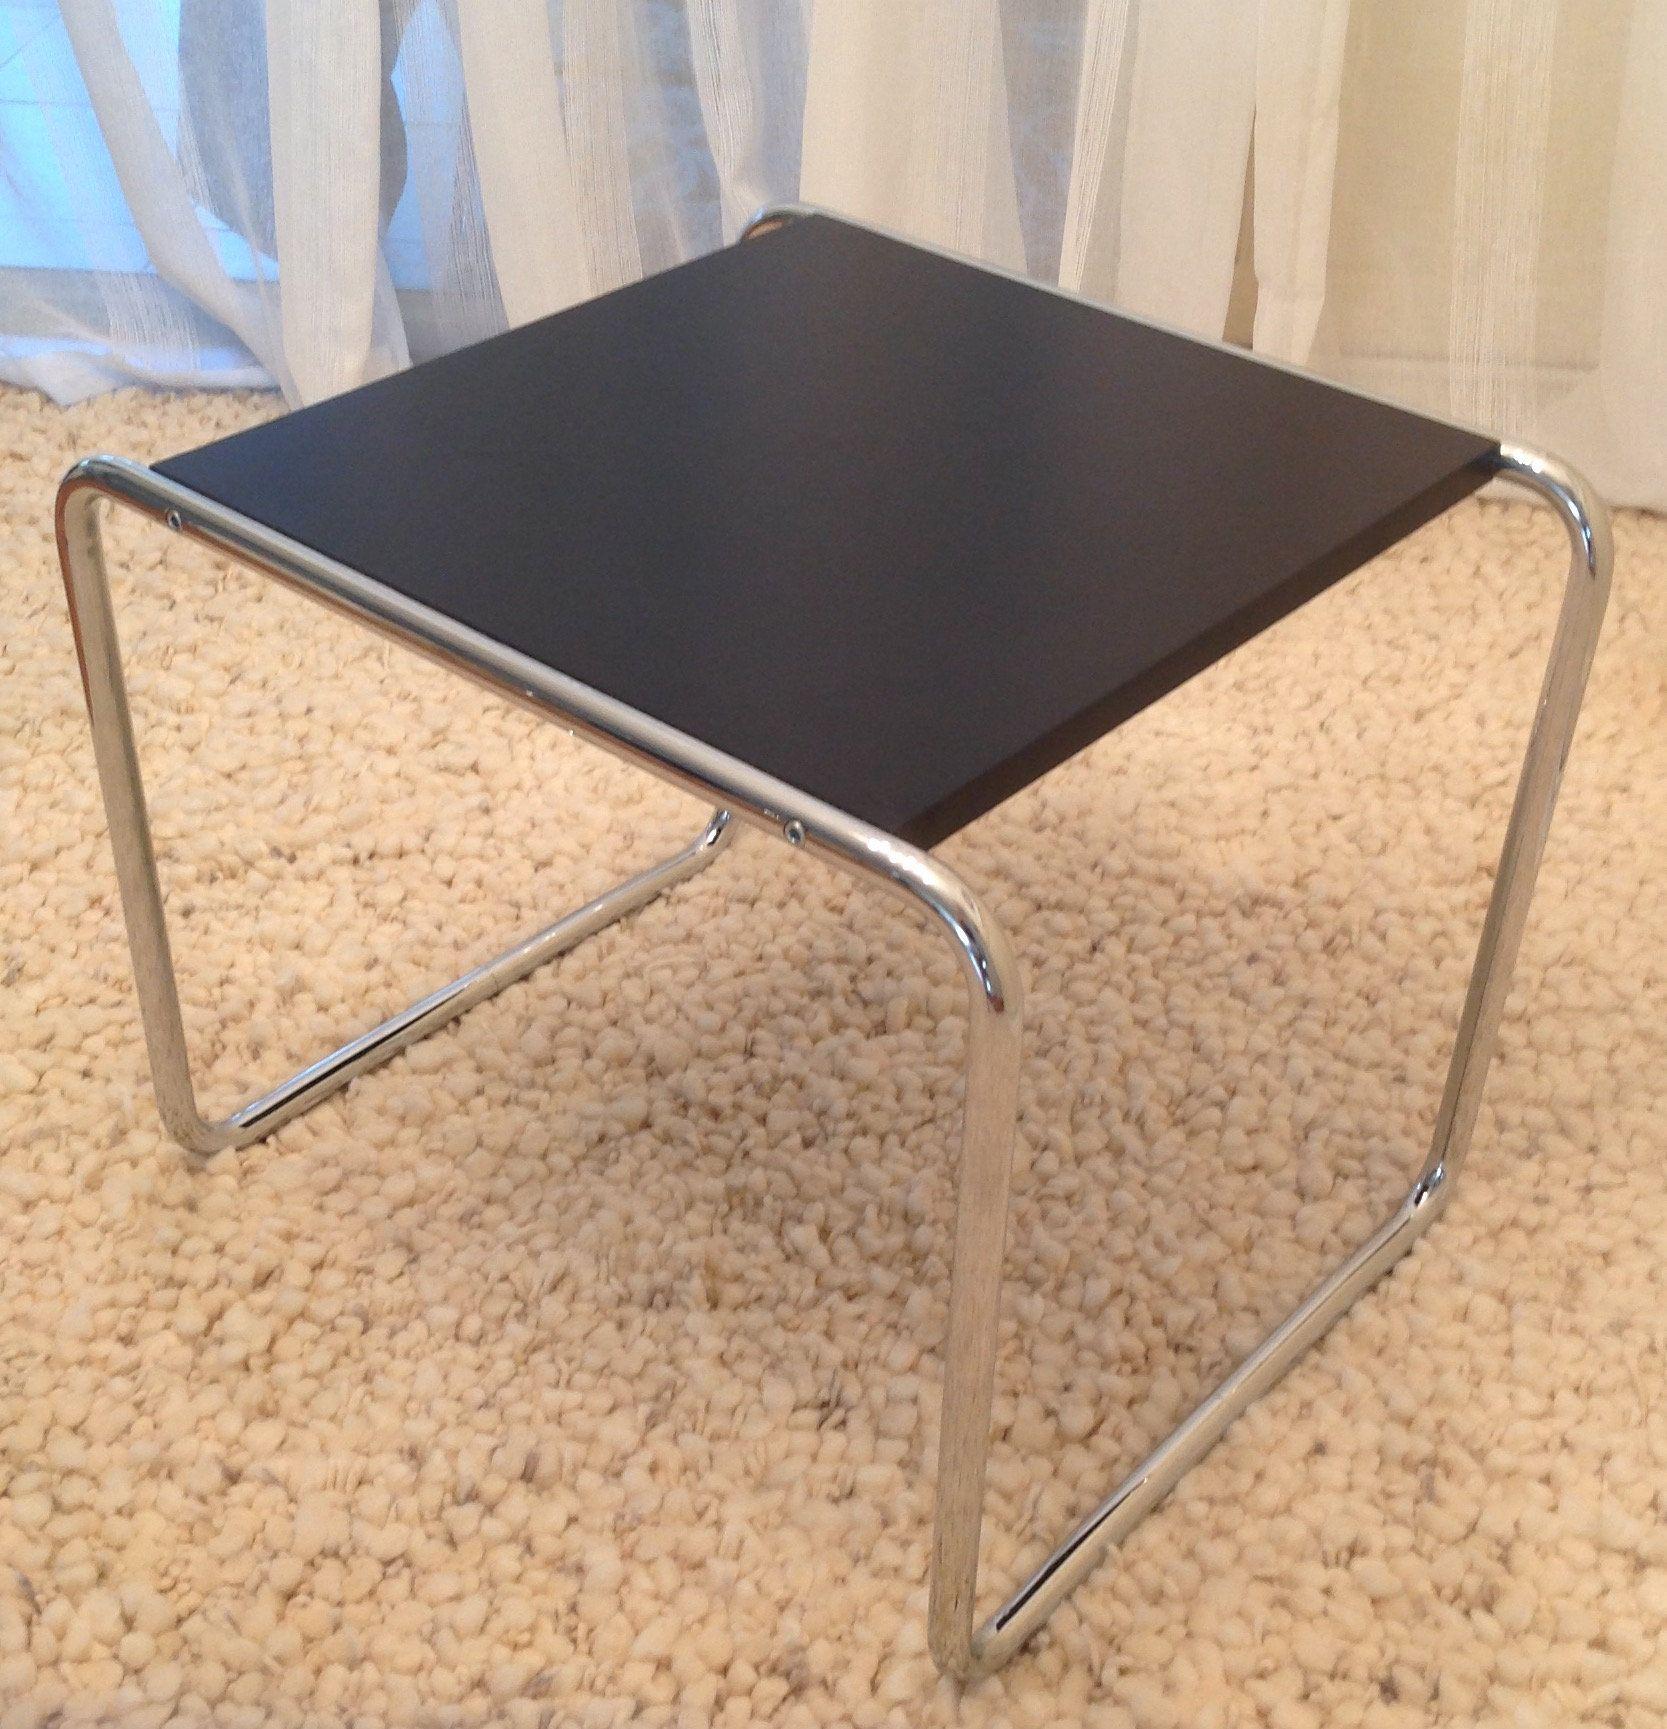 Marcel Breuer Small Laccio Table For Gordon International By Retroappeal